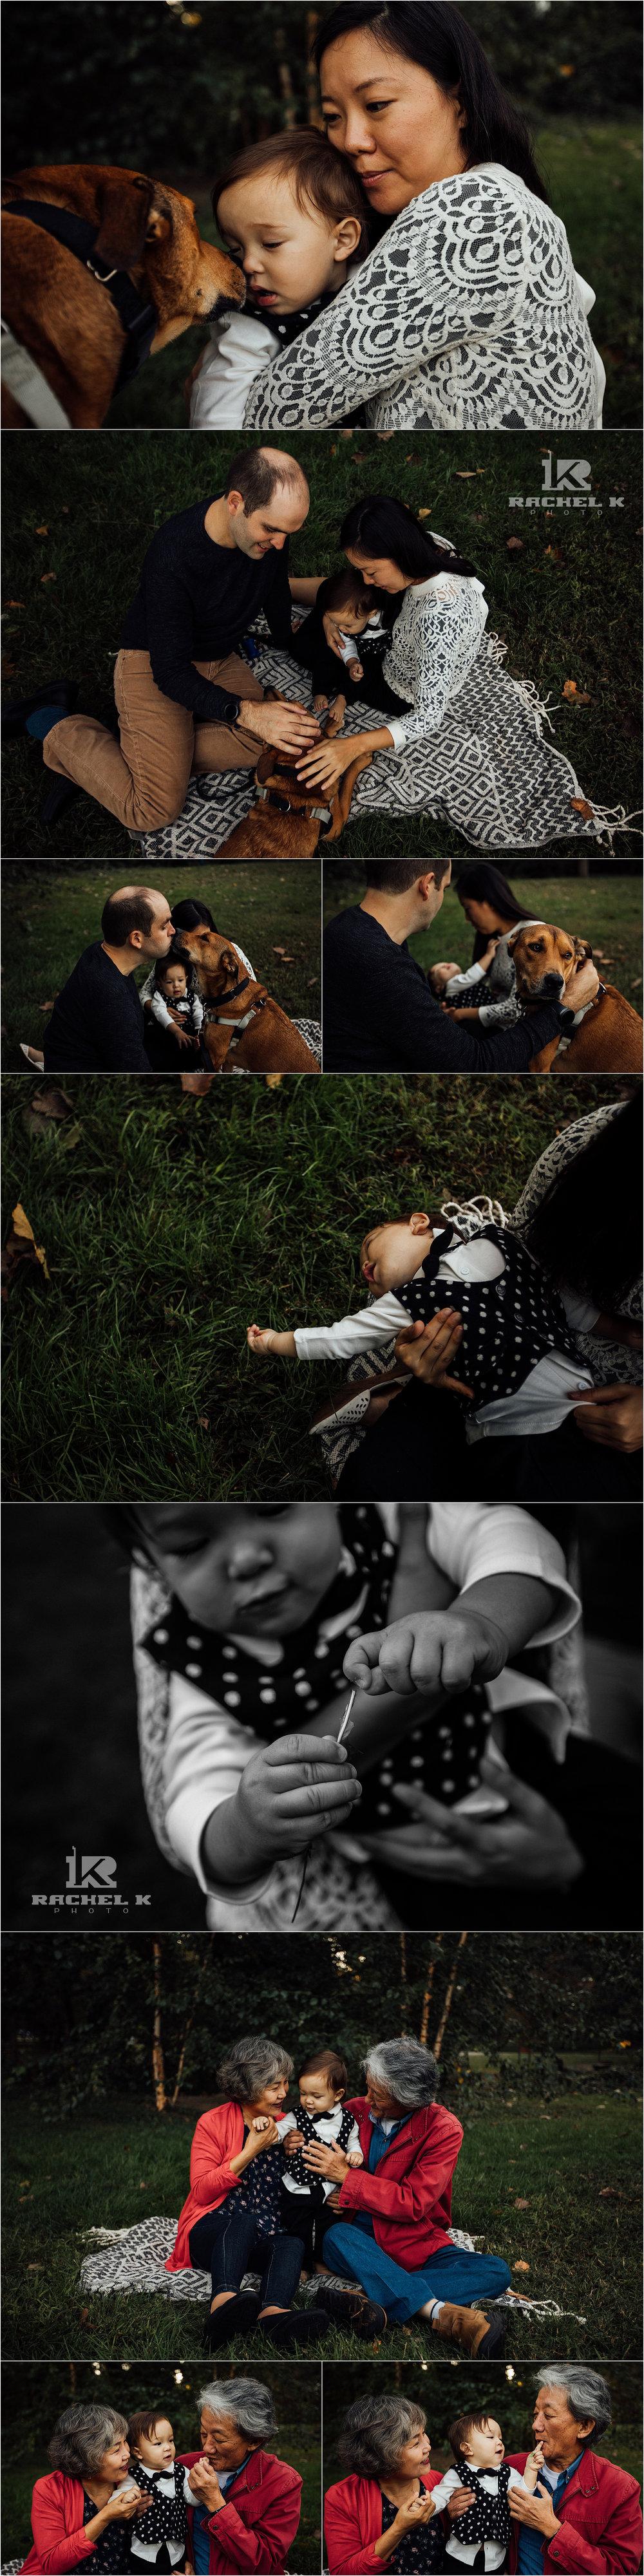 Arlington Virginia family photographer Rachel K Photo